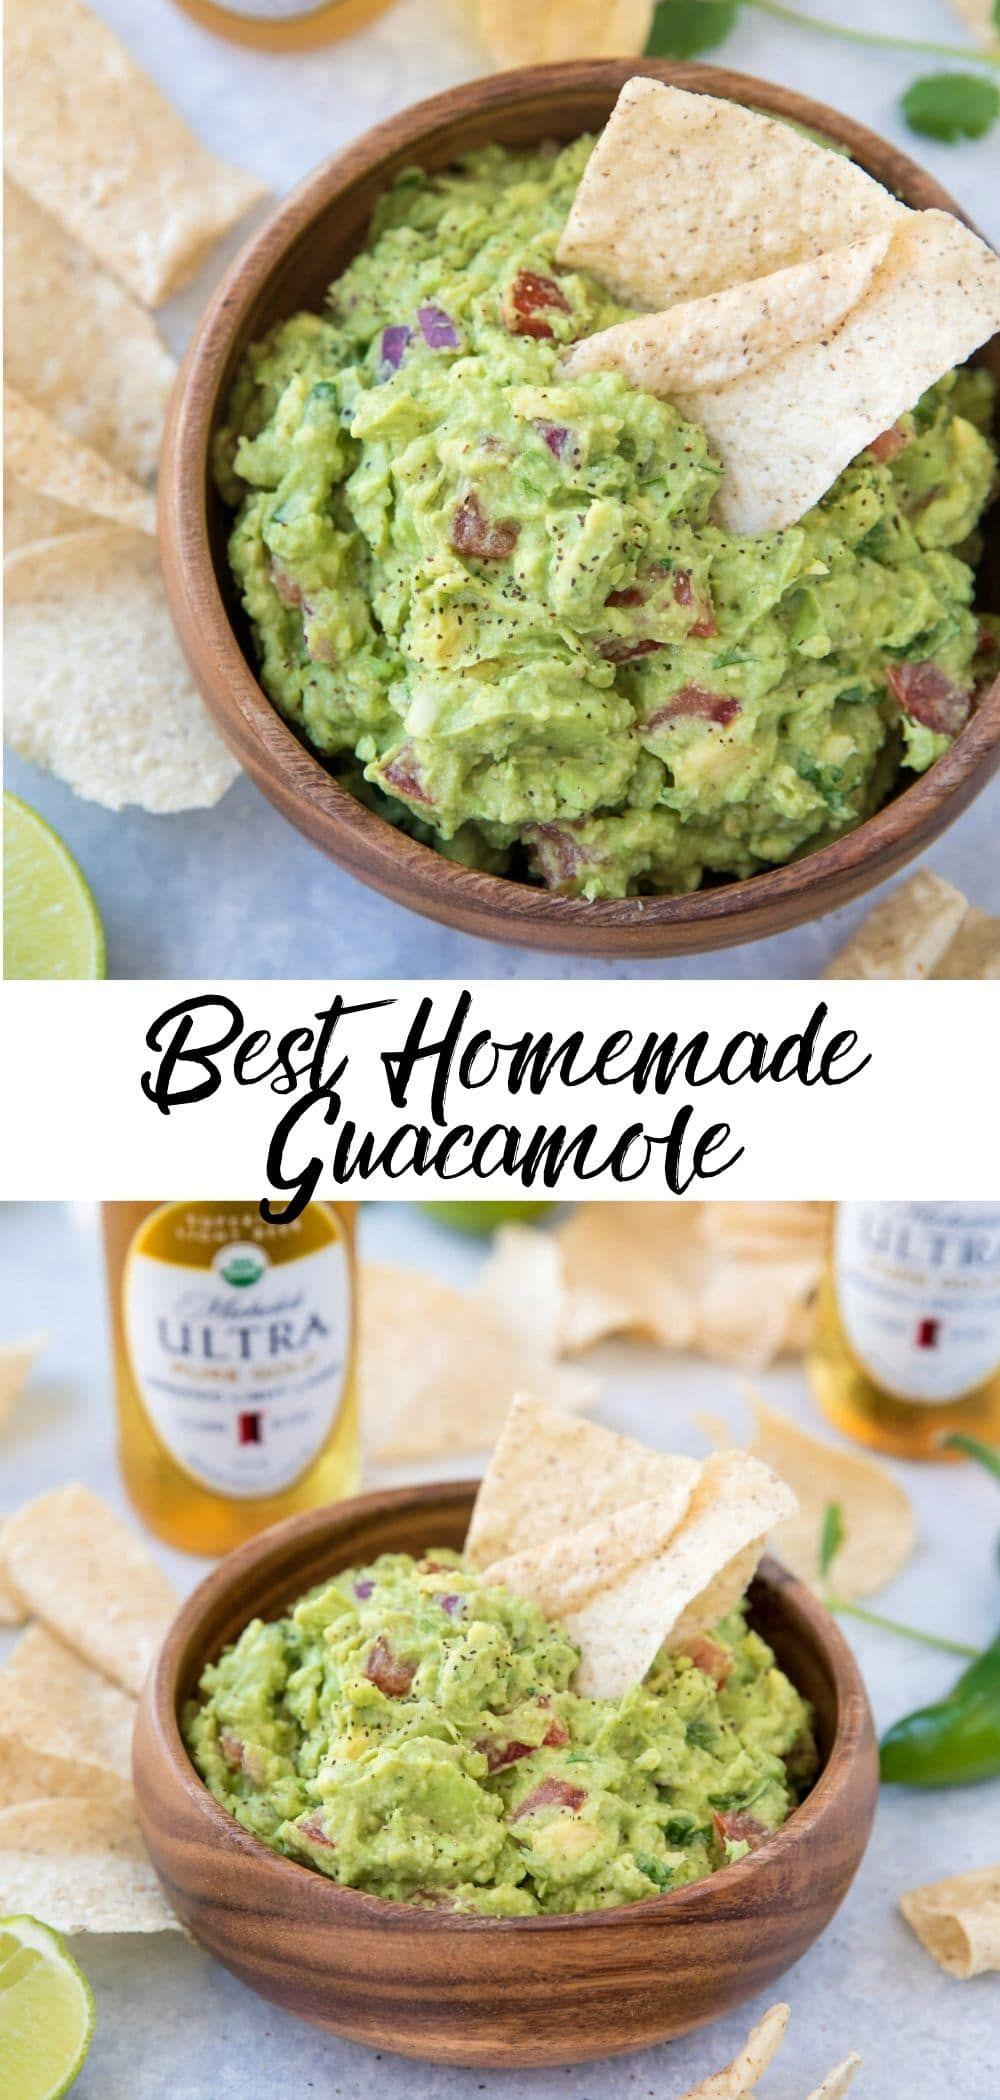 Best Homemade Guacamole {video} - Kim's Cravings